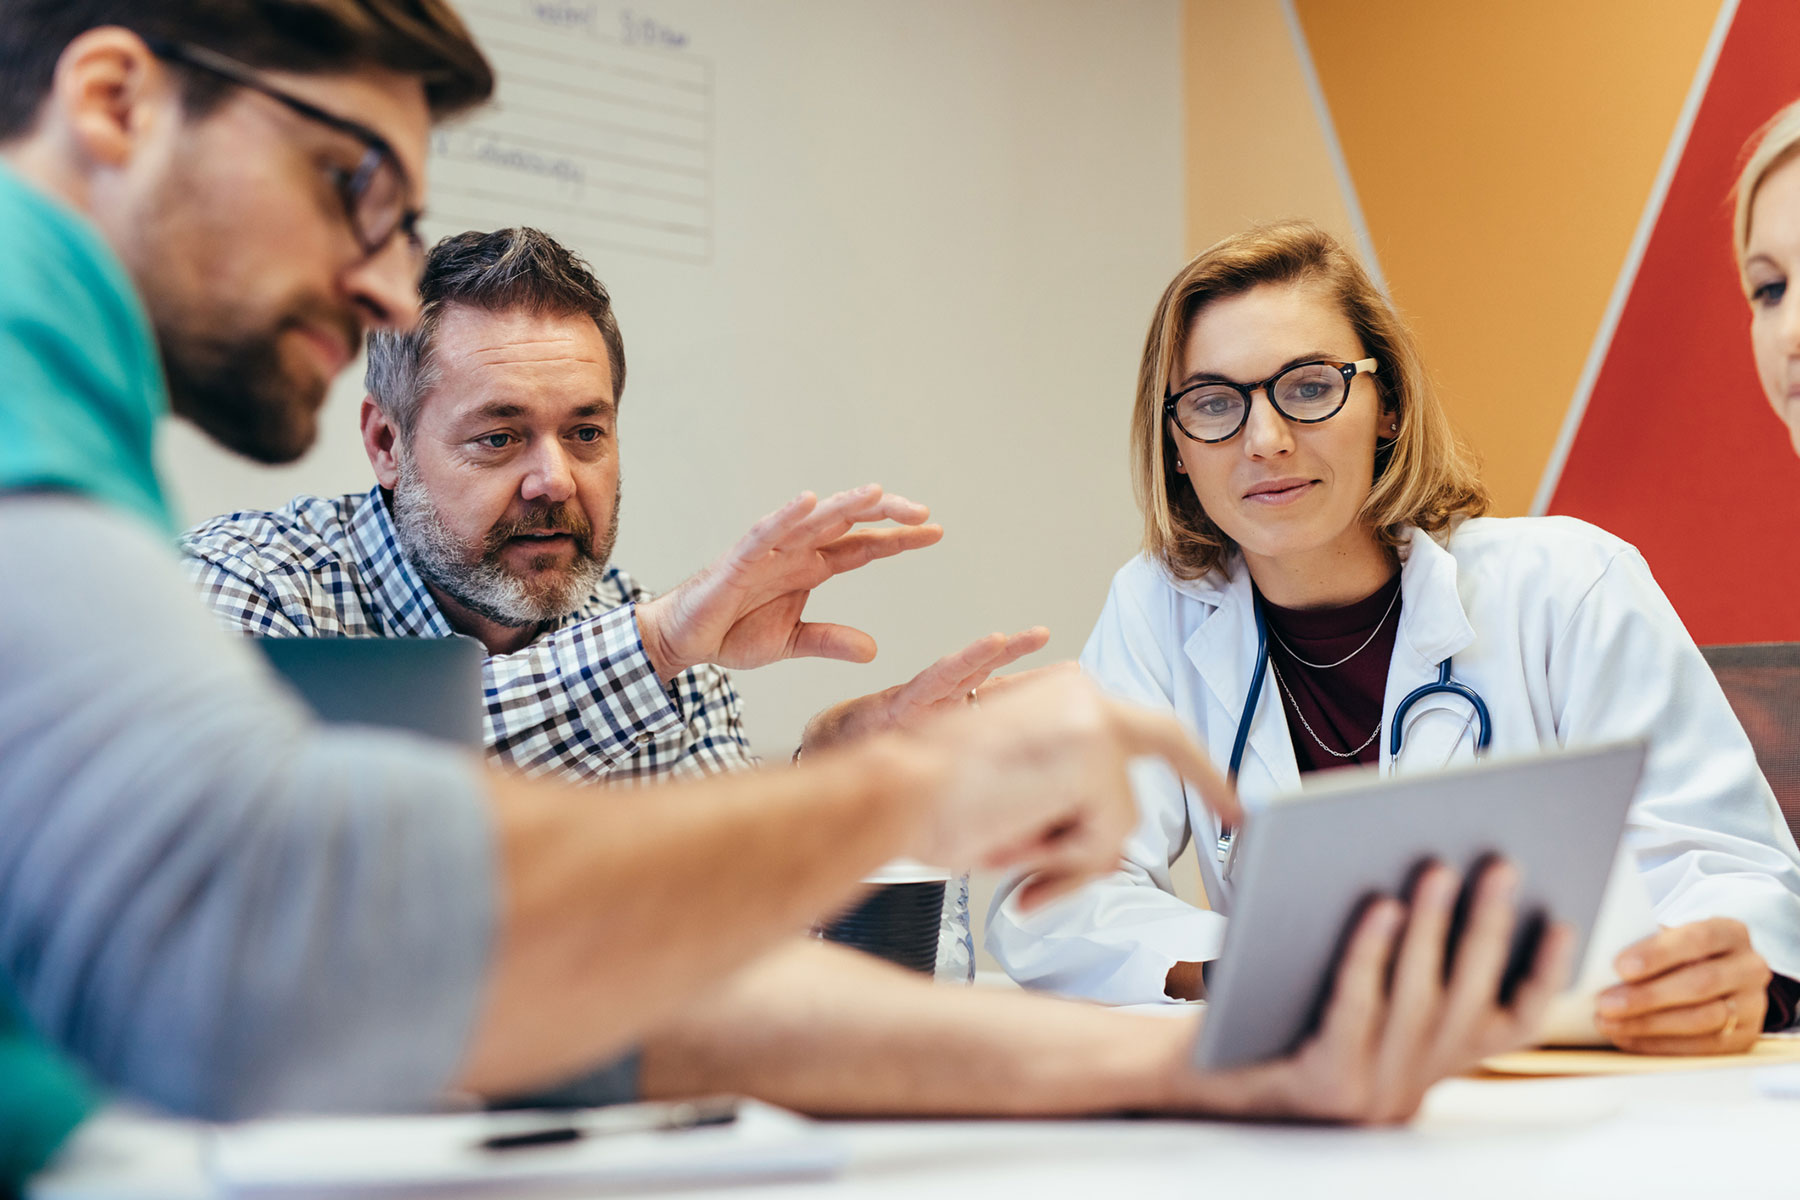 Medical staff briefing